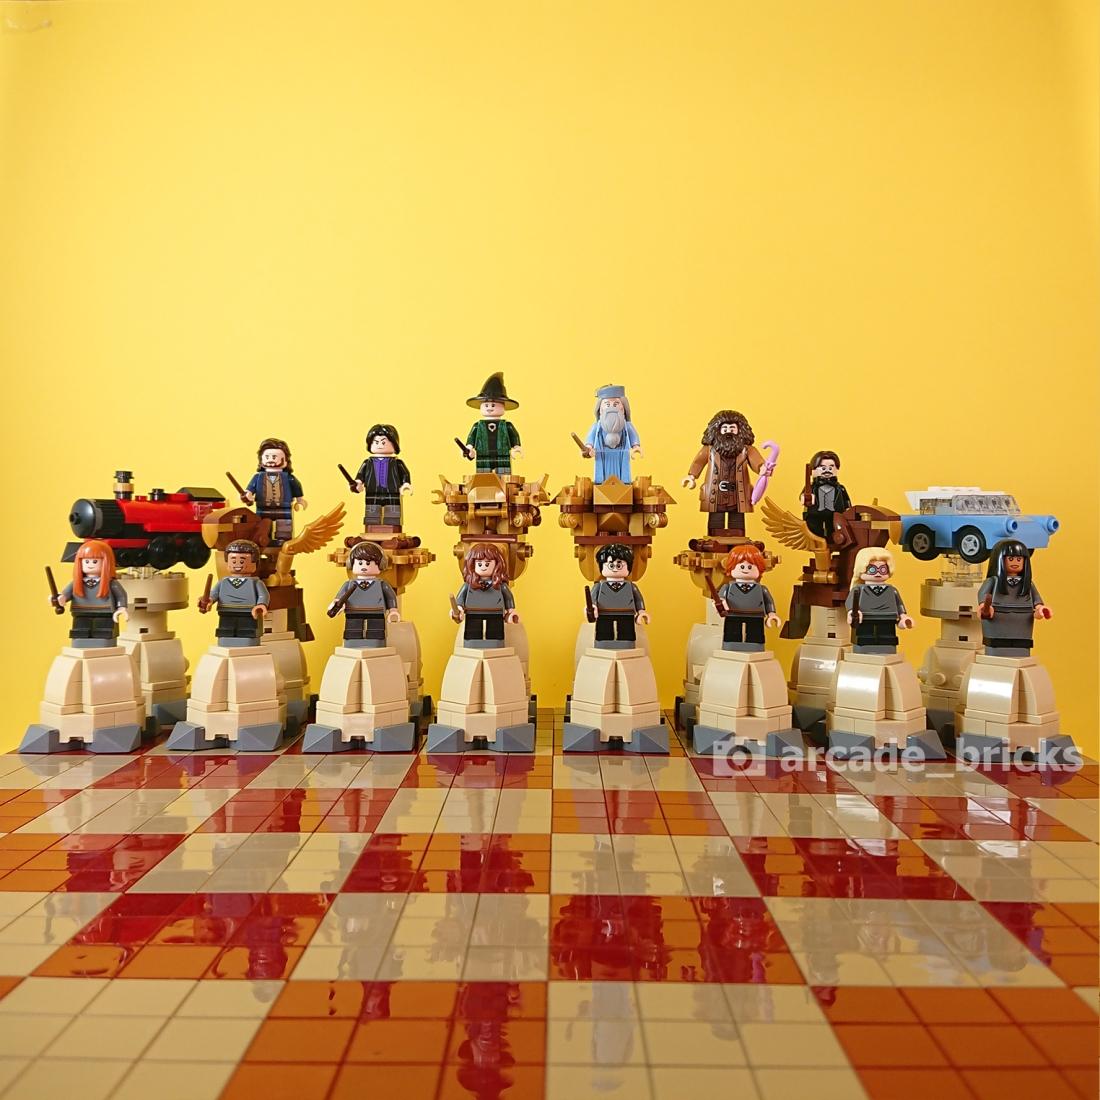 arcade_bricks_chess_good_00_all